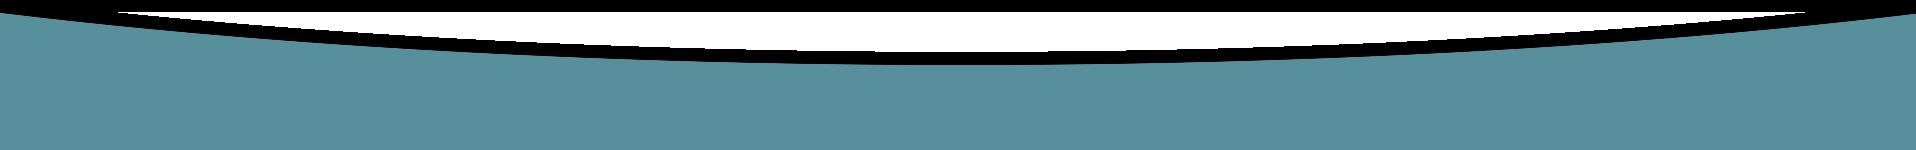 footer-gradient-top-blue